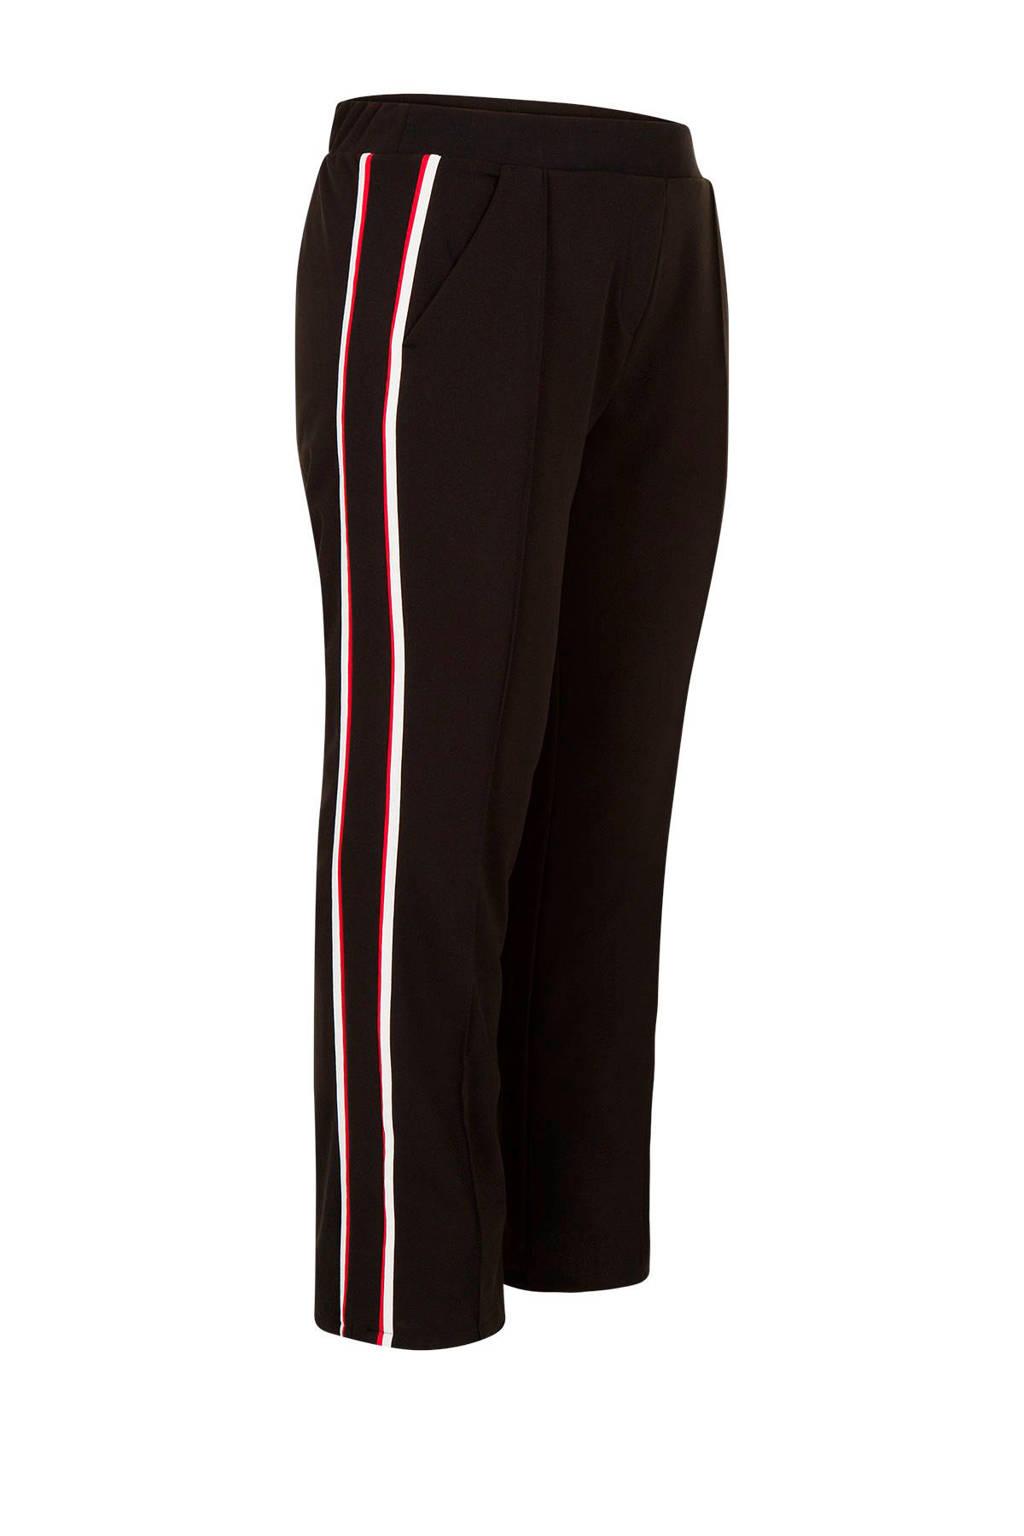 Miss Etam Plus pantalon met contrasterende bies, Zwart